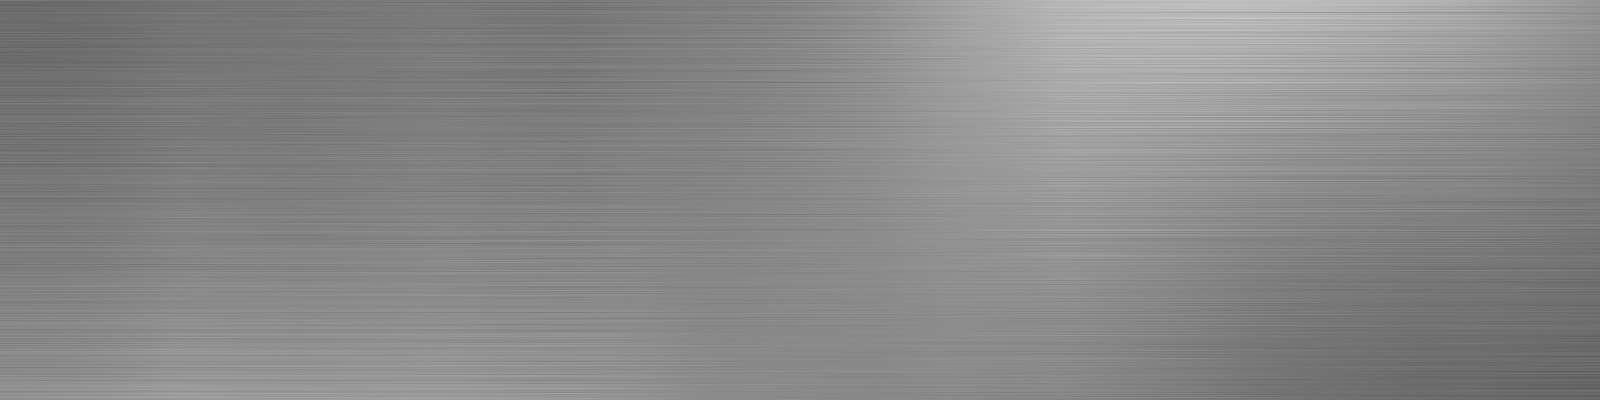 Aluminium Suppliers - Stainless & Alloy Supplies